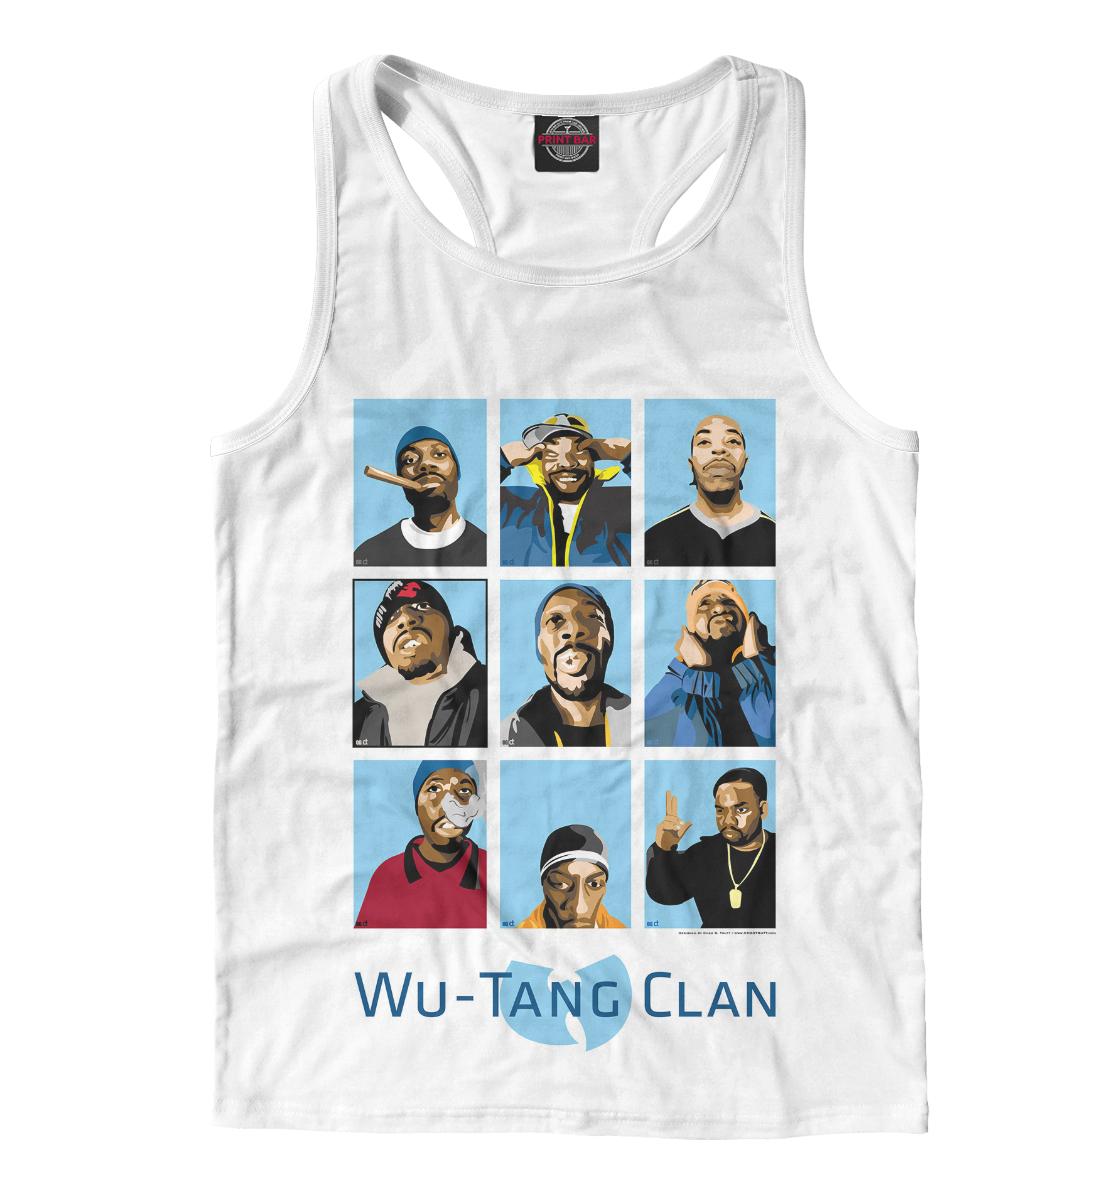 Купить Wu-Tang Clan, Printbar, Майки борцовки, WTK-204372-mayb-2